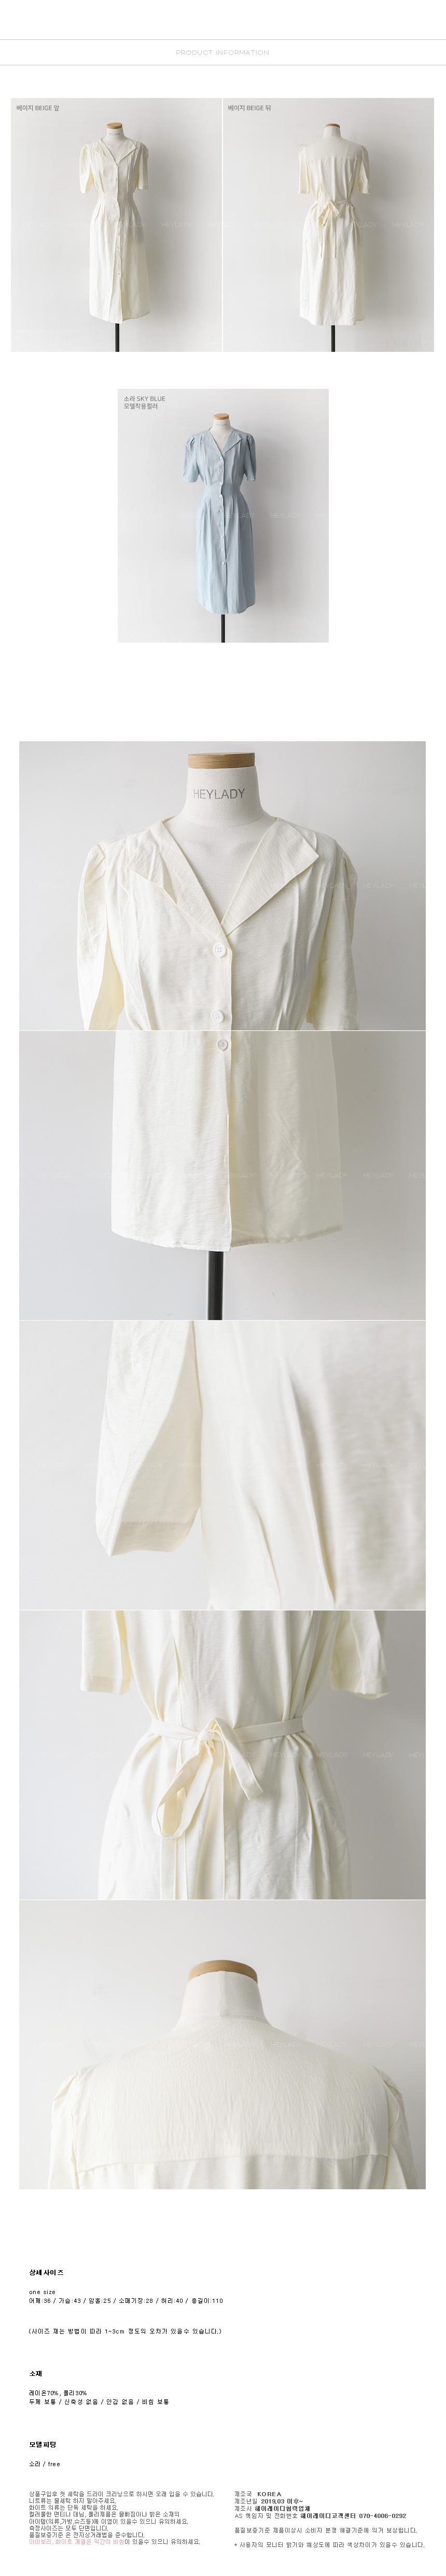 Bleavikara Dress